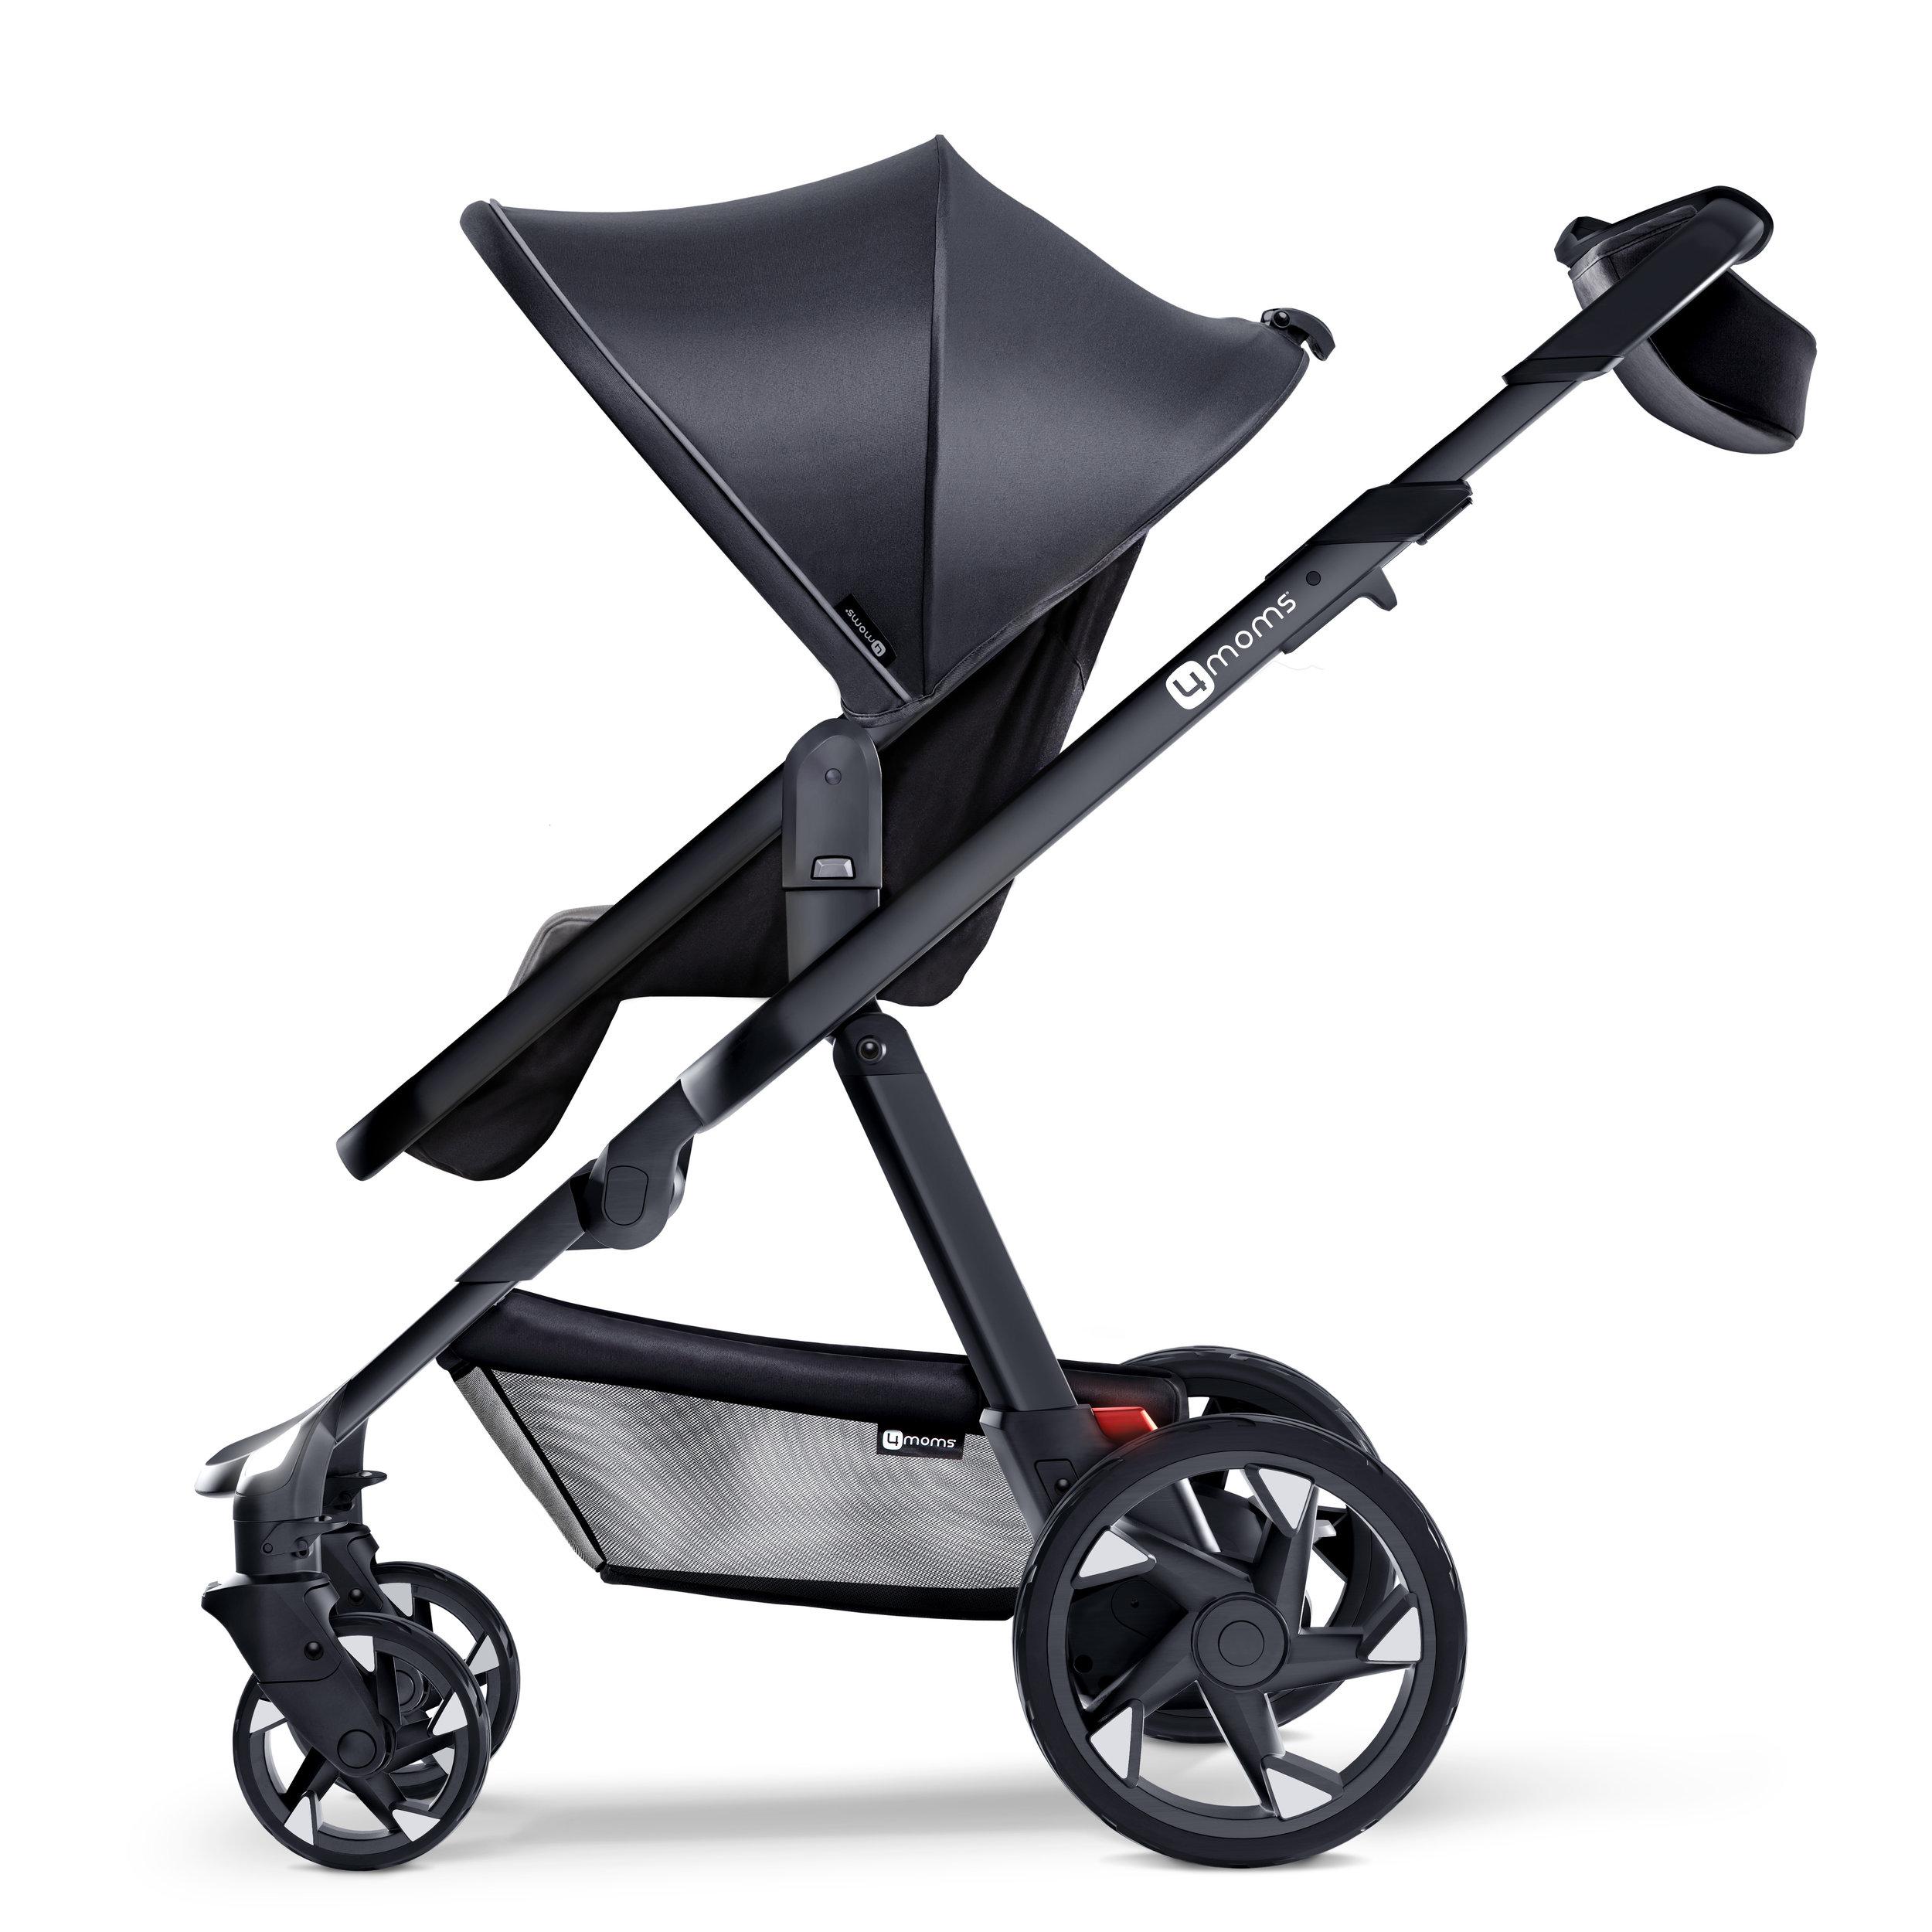 Moxi stroller, copyright 4moms